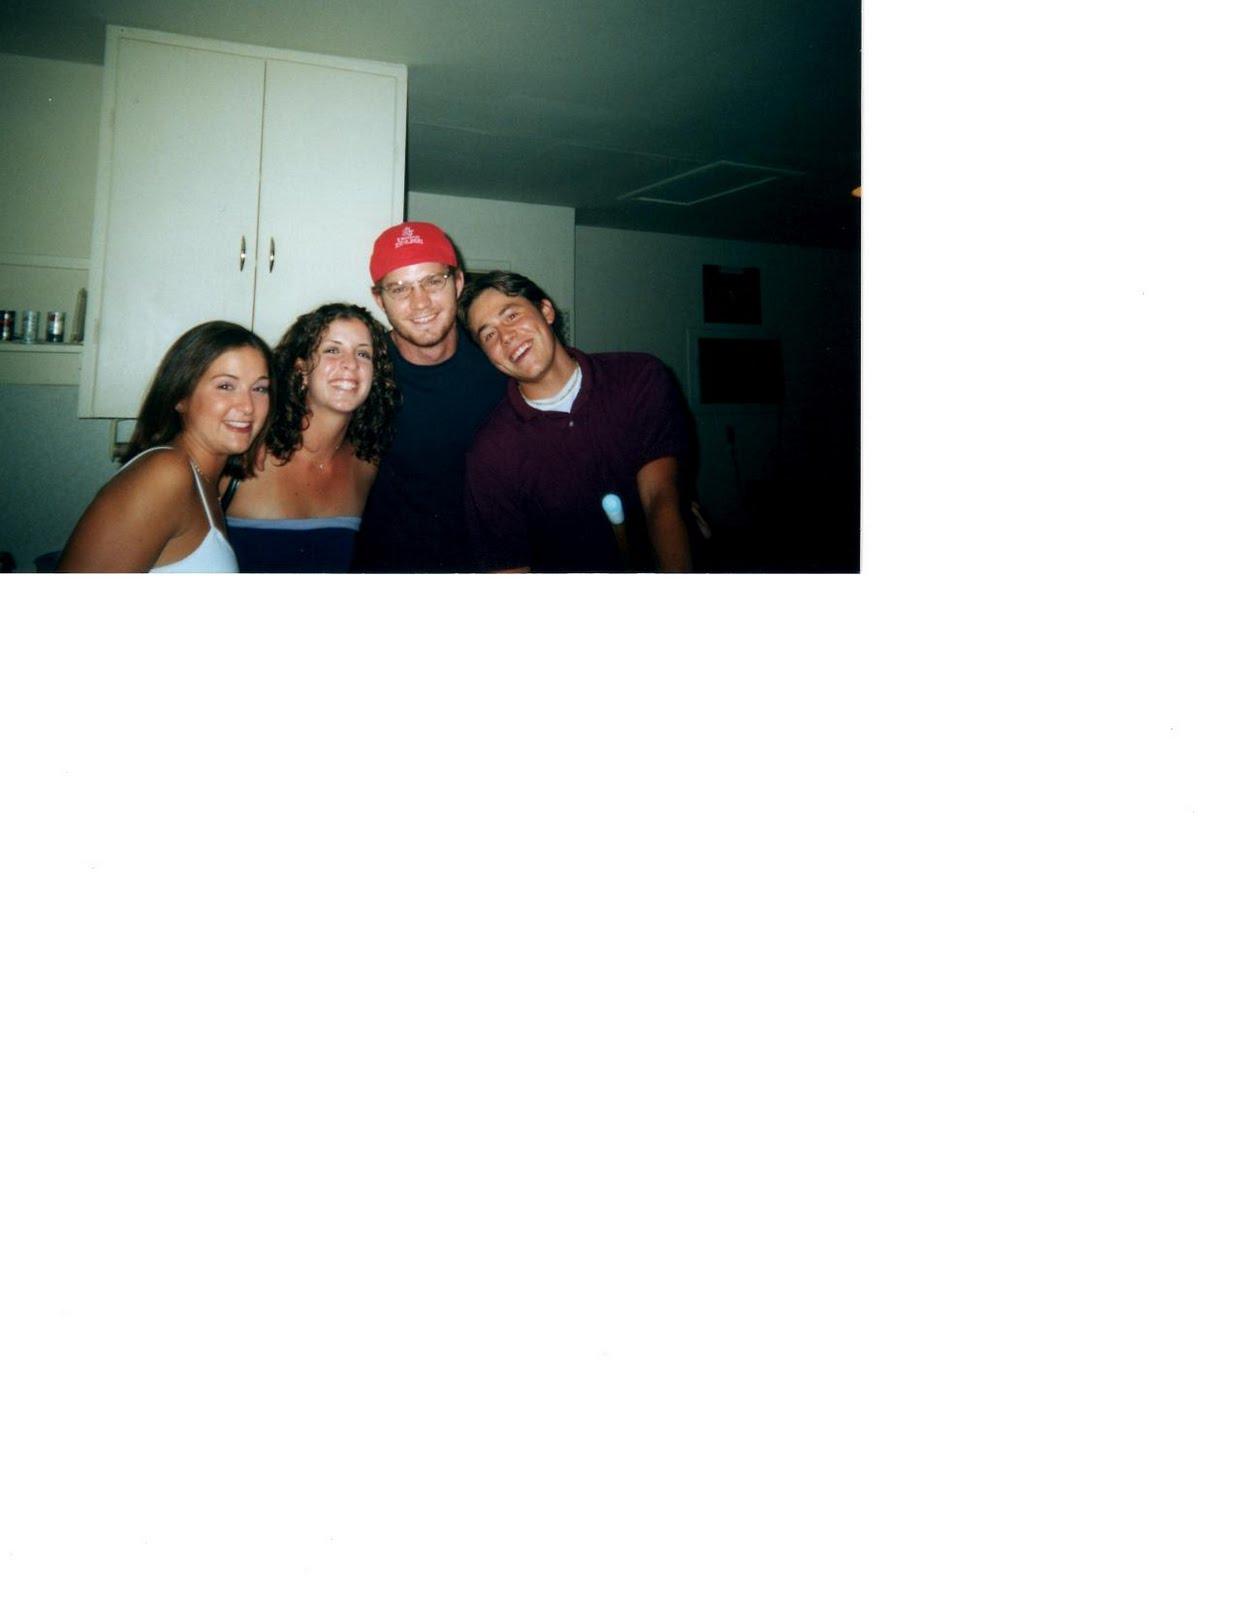 http://4.bp.blogspot.com/-BJqojSISWbU/TkrYZxBEvWI/AAAAAAAAEgA/4hZ8Mr5Qhjc/s1600/chsfriends.JPG